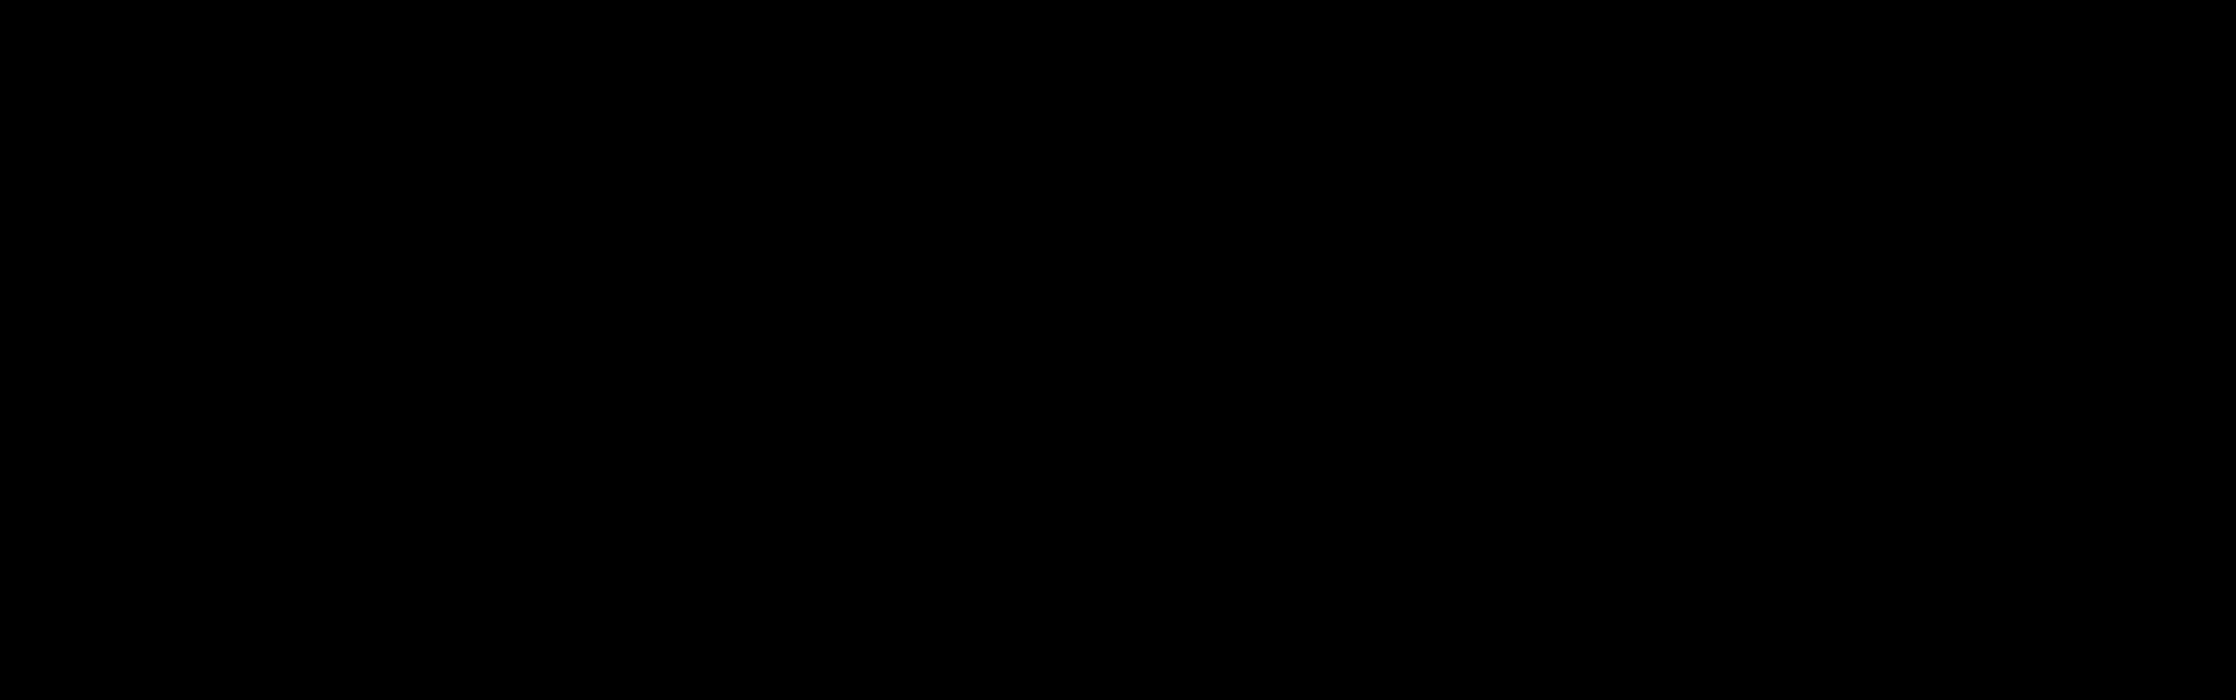 (E)-N-(4-Methoxy-d<sub>3</sub> 3-methoxyphenyl)-3-(3-(3,4,5-trimethoxyphenyl)-1H-pyrazol-5-yl)acrylamide